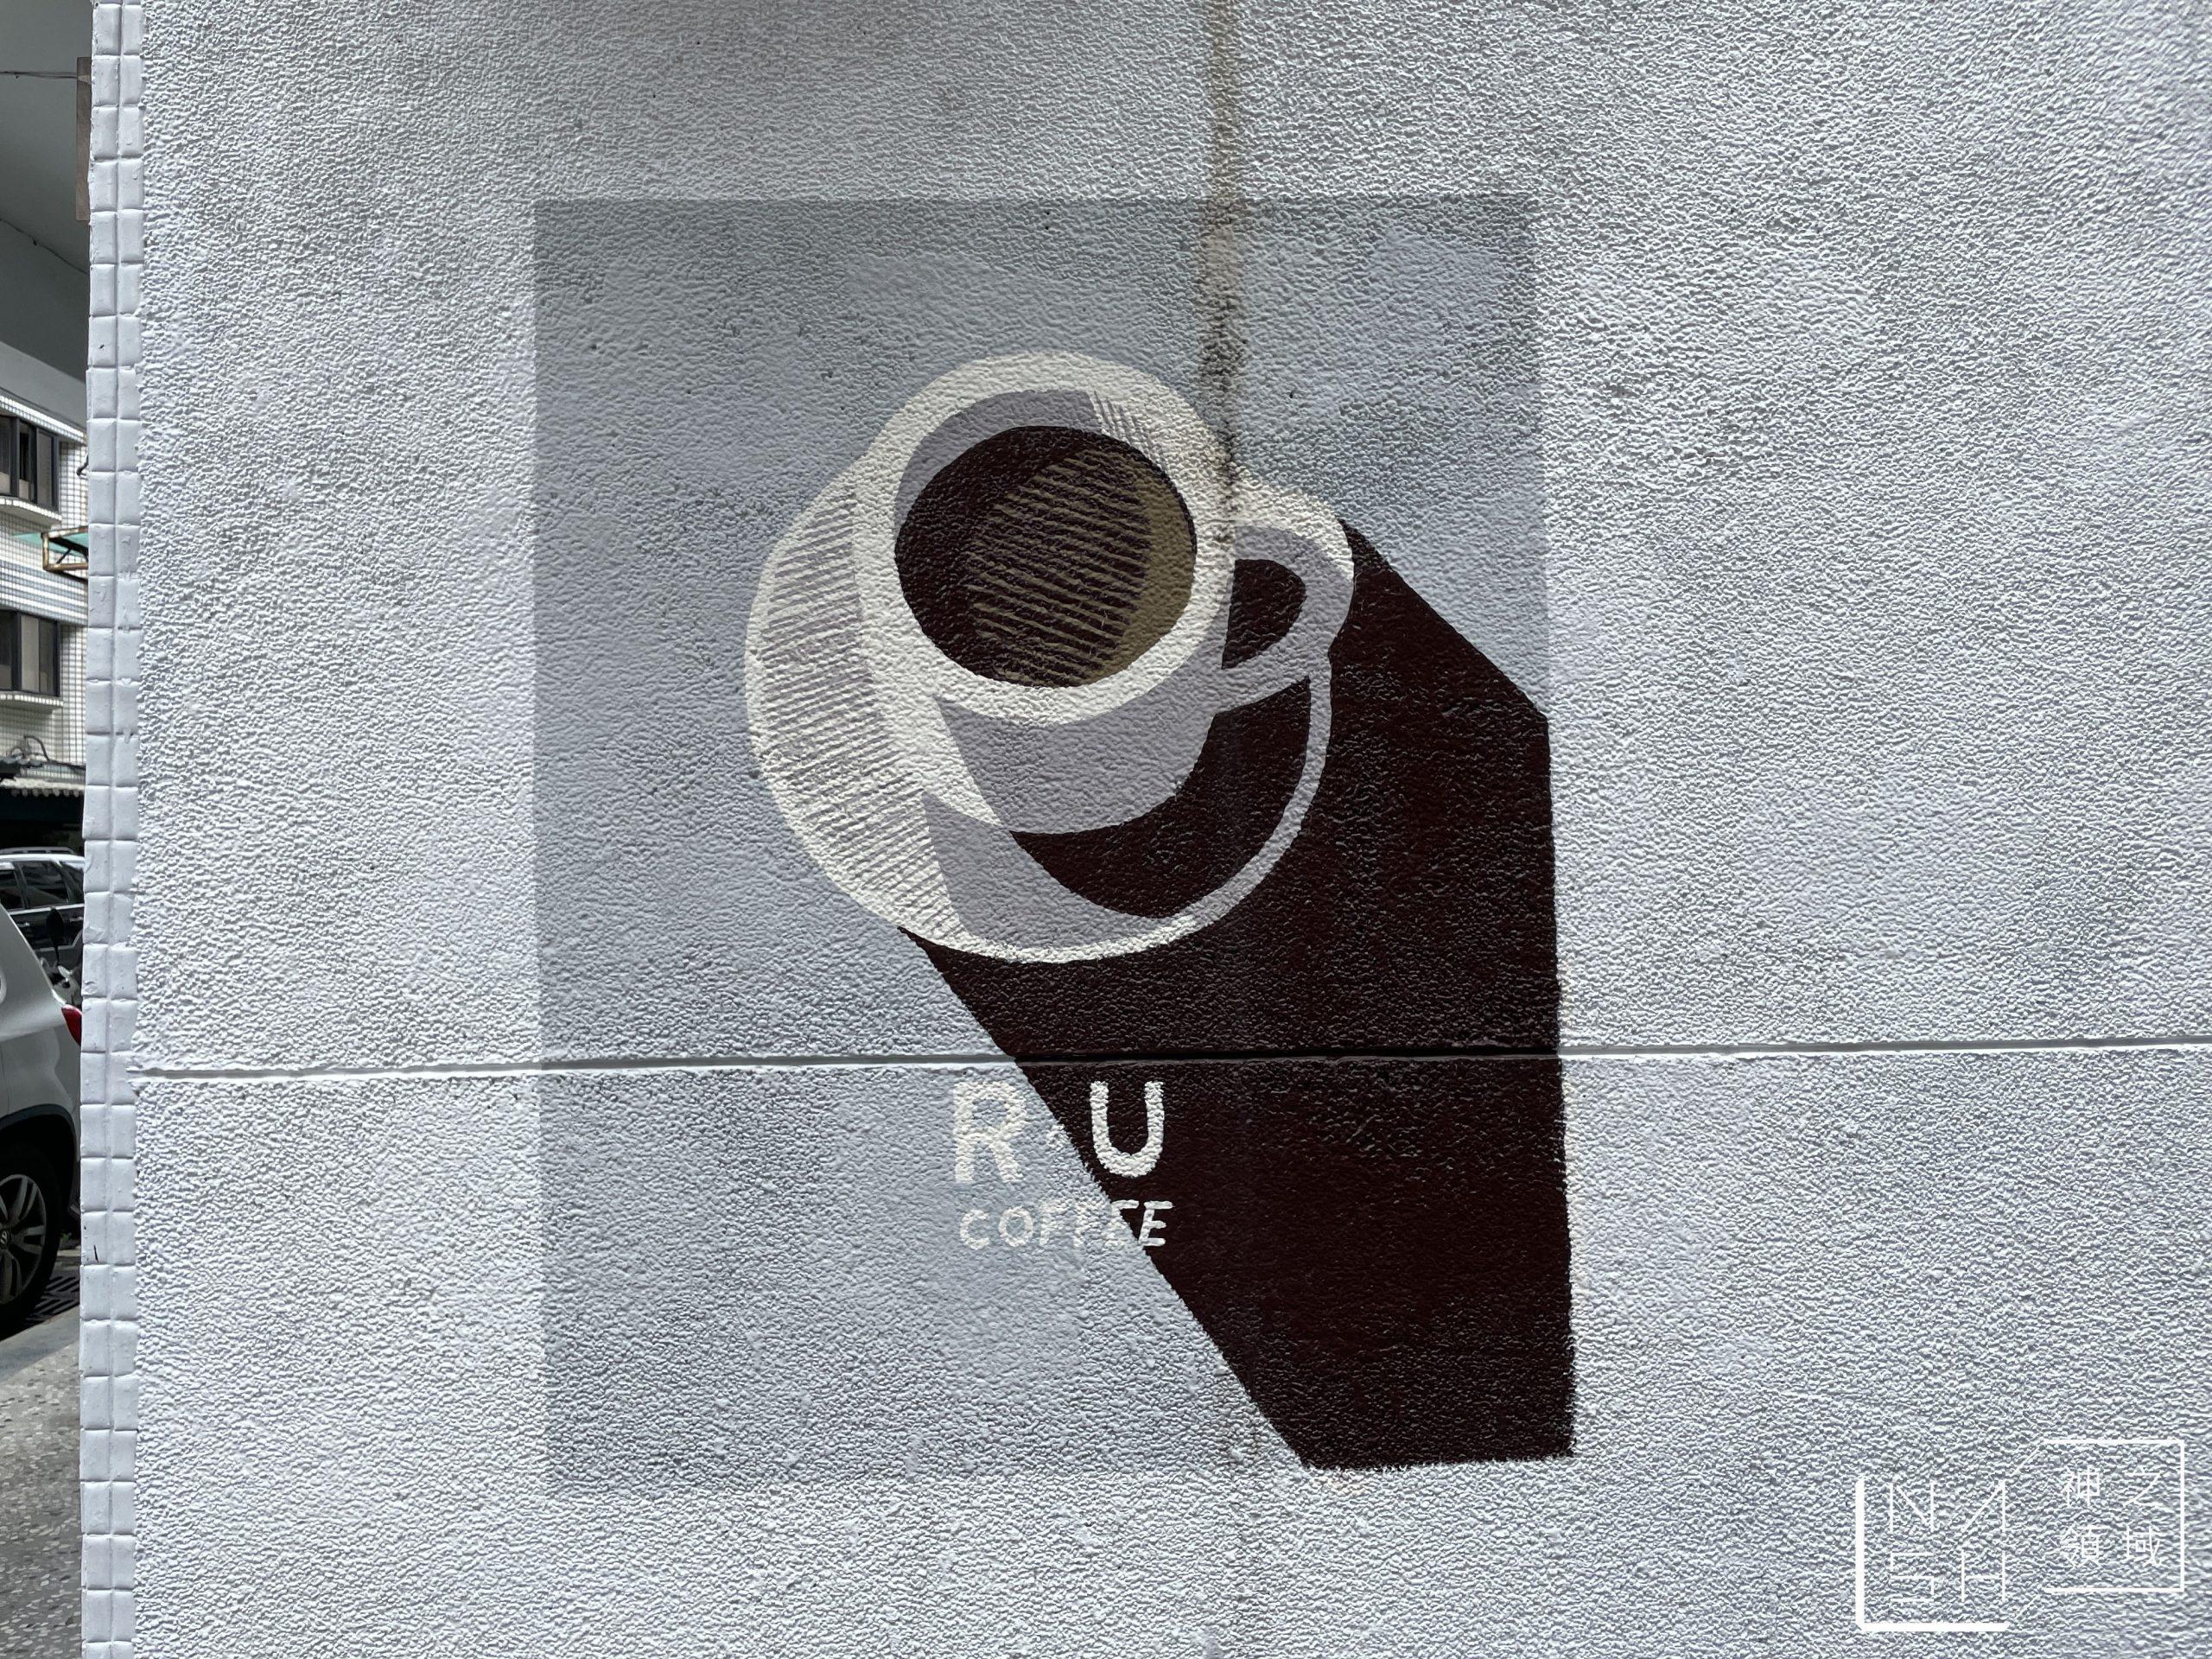 R.U Coffee,北投美食,北投咖啡,RU COFFEE